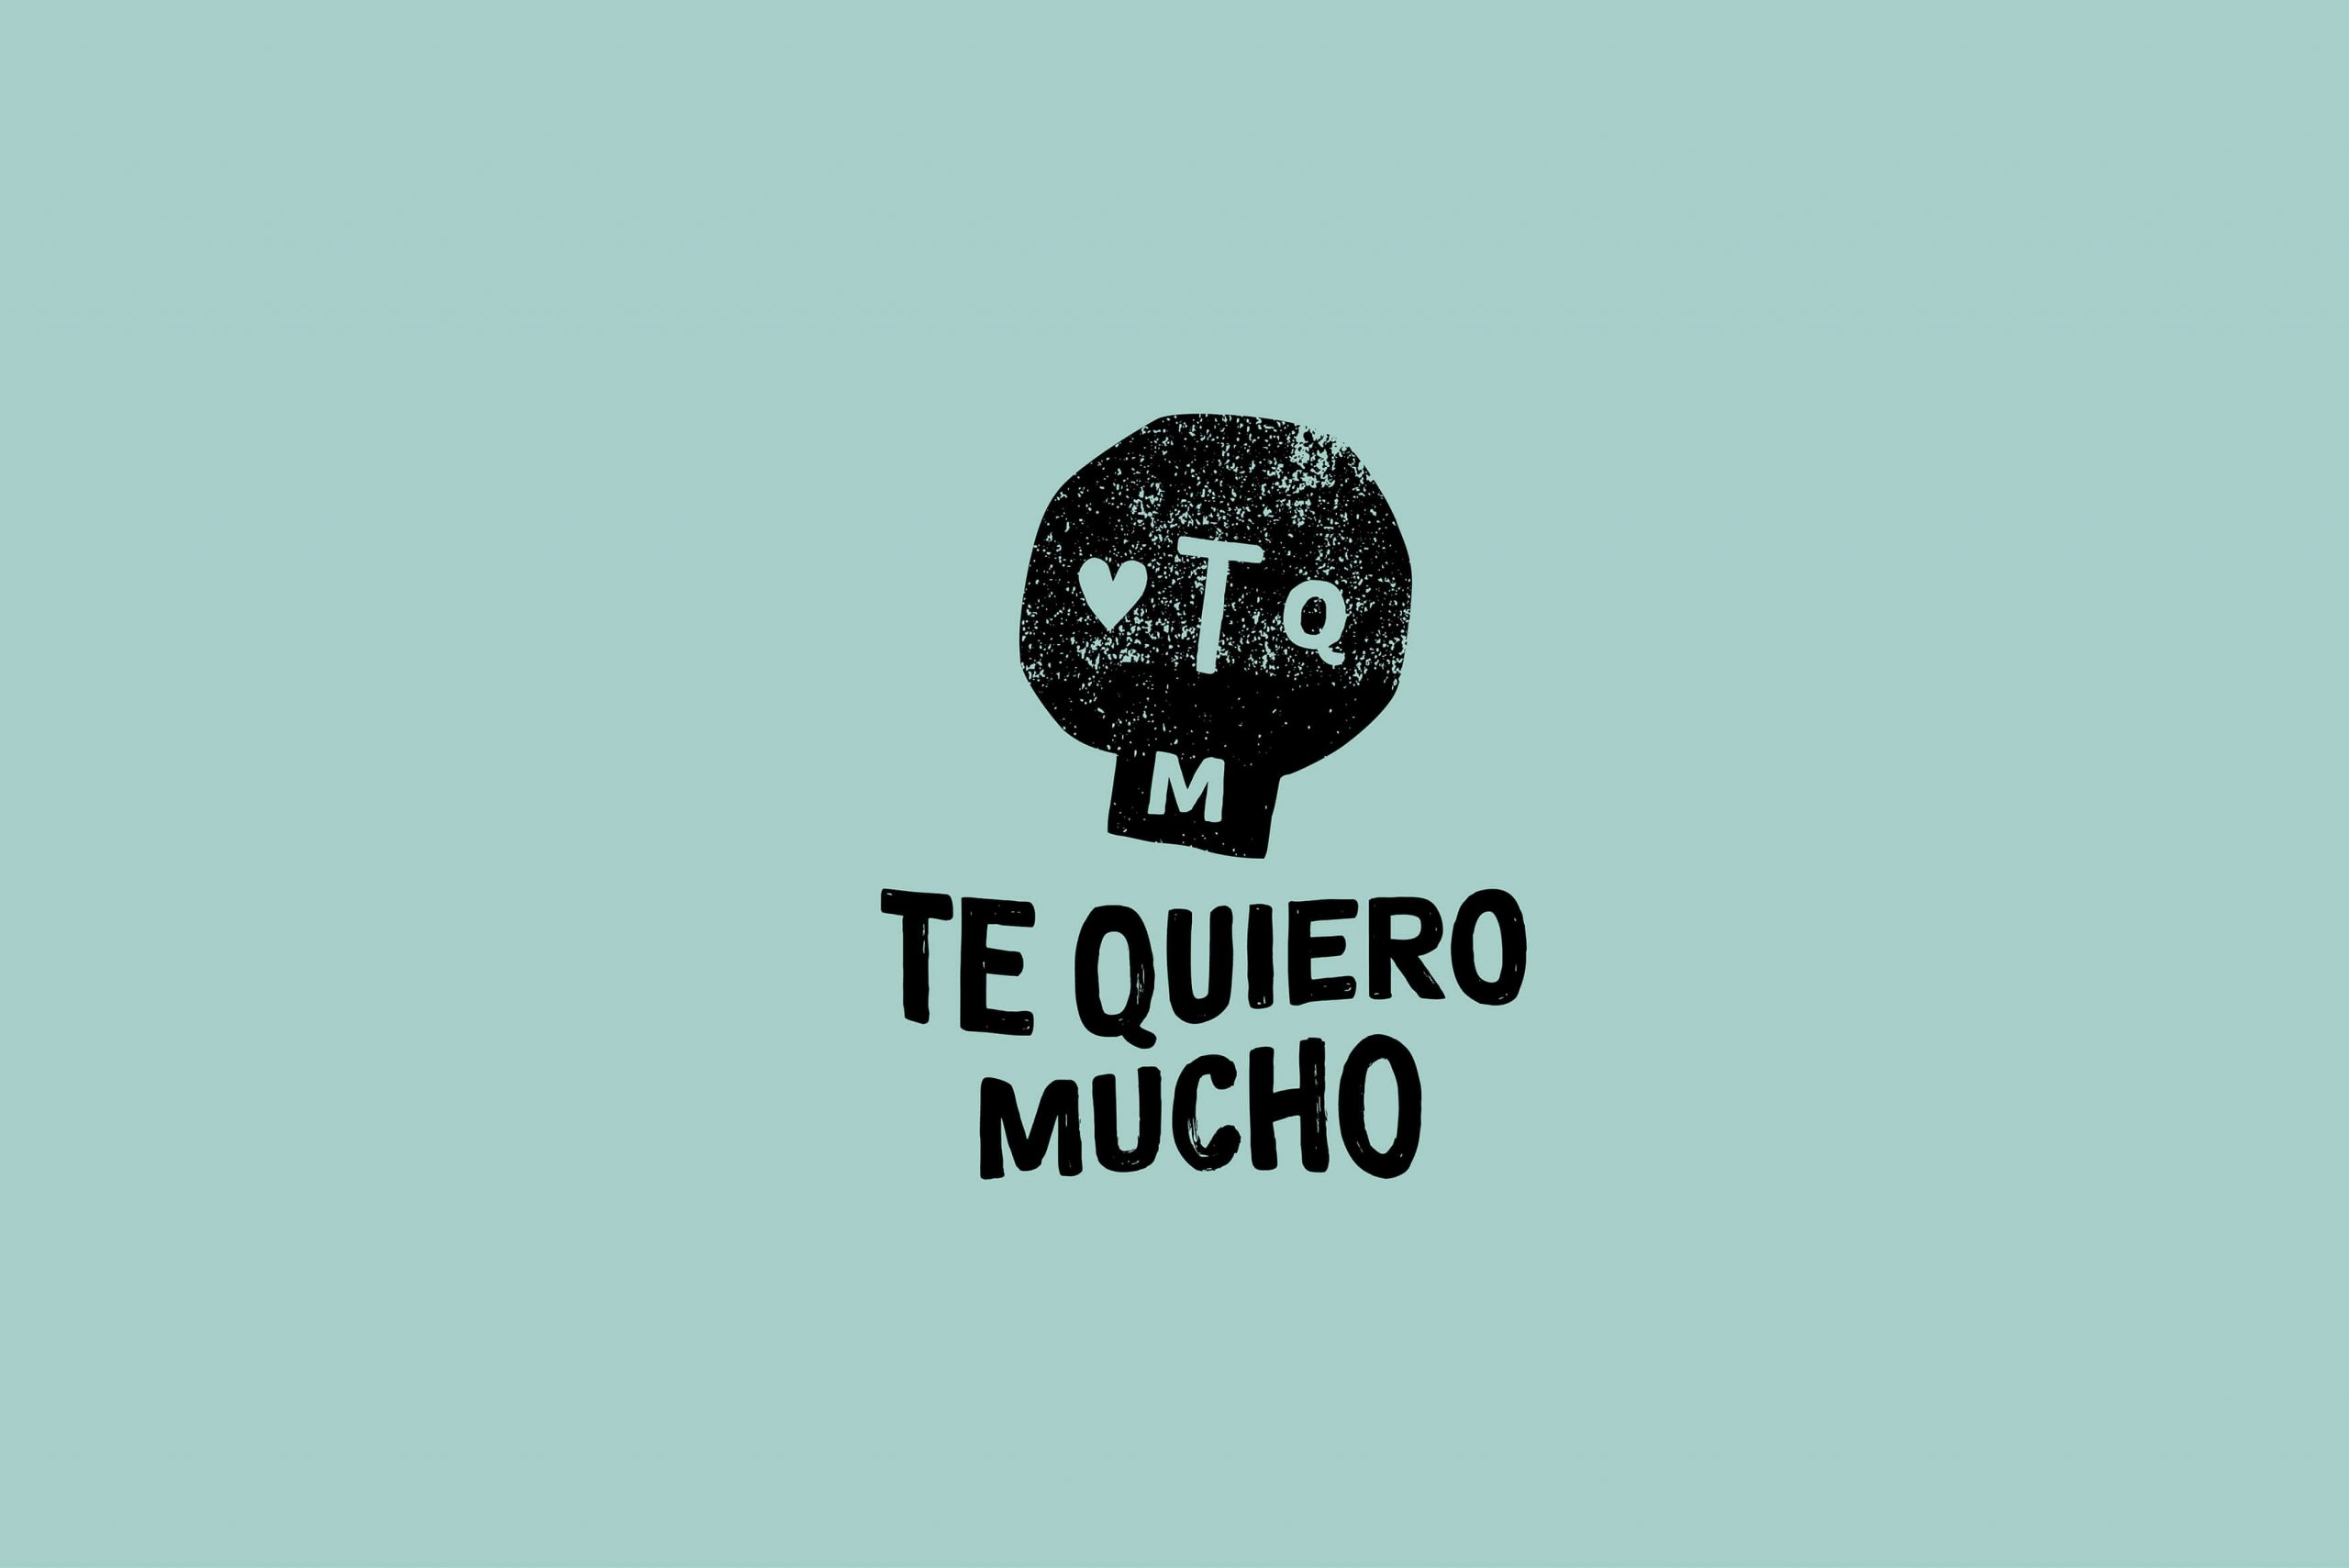 Ovolo Te Quiero Mucho Hospitality Identity - Logotype